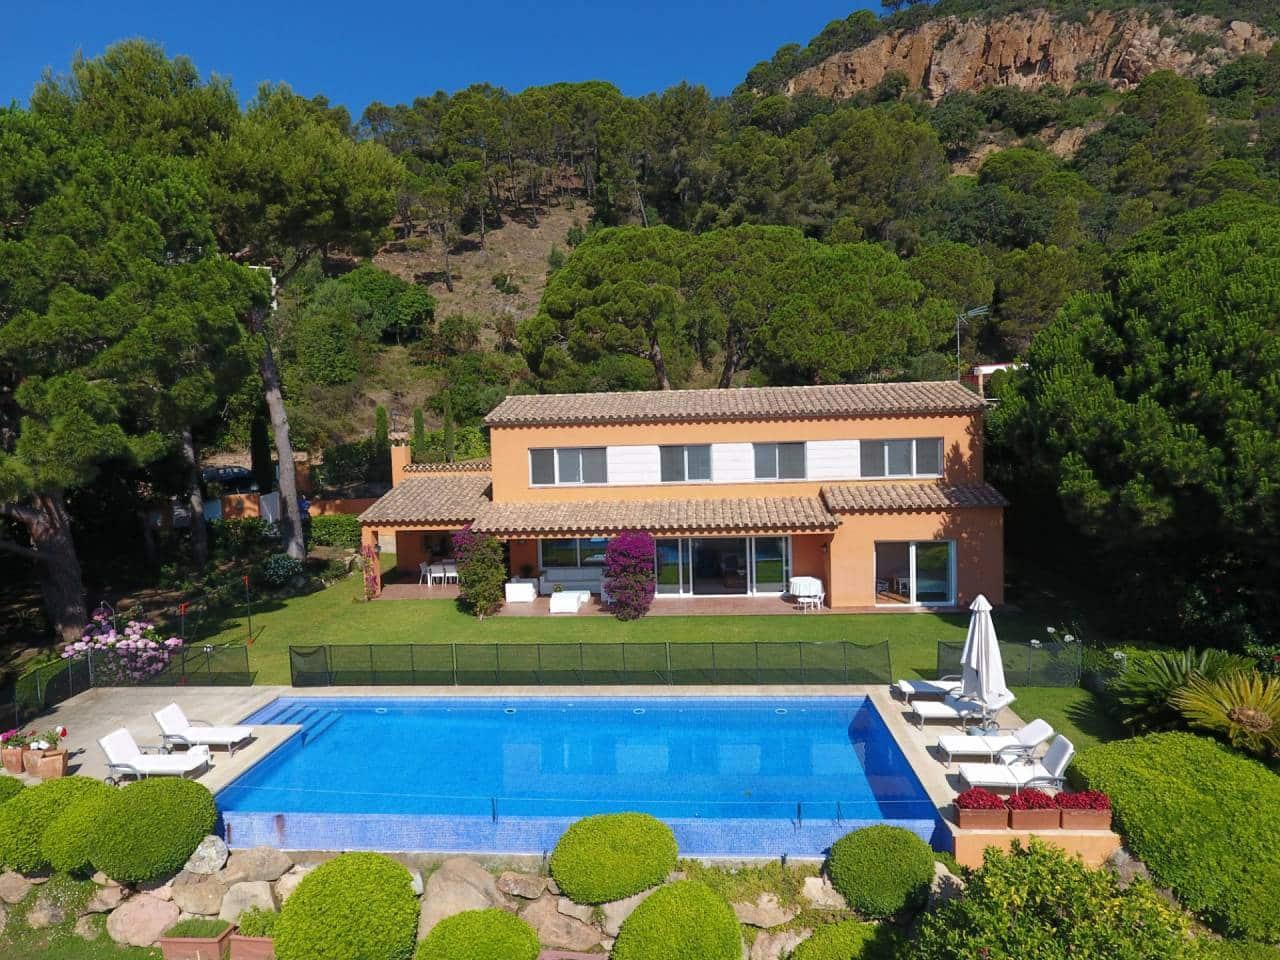 5 Zimmer Haus zu verkaufen in Sant Feliu de Guixols - 3.500.000 € (Ref: 4054144)